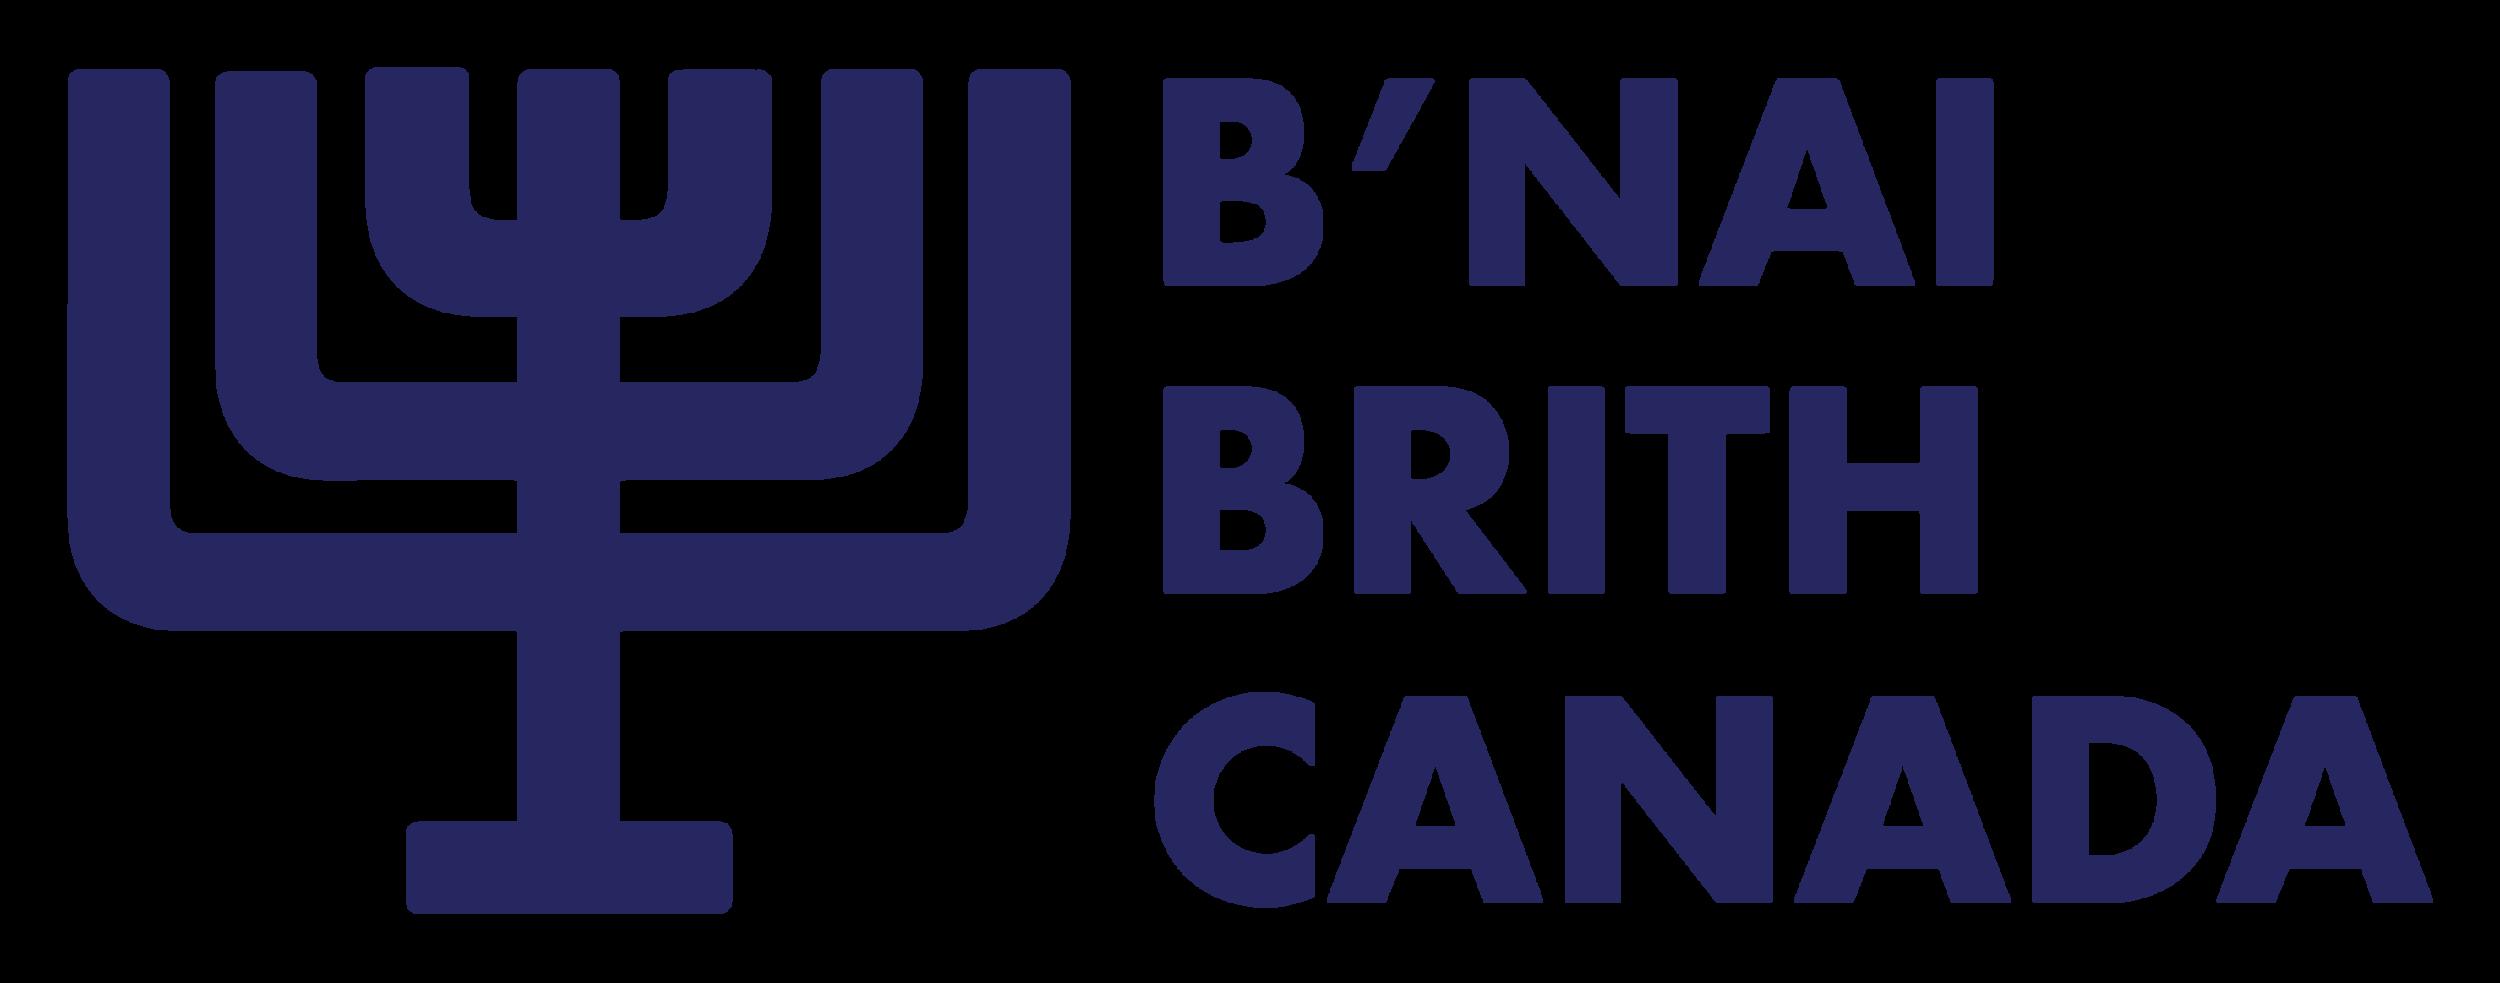 Bnai Brith Logo High Res.png